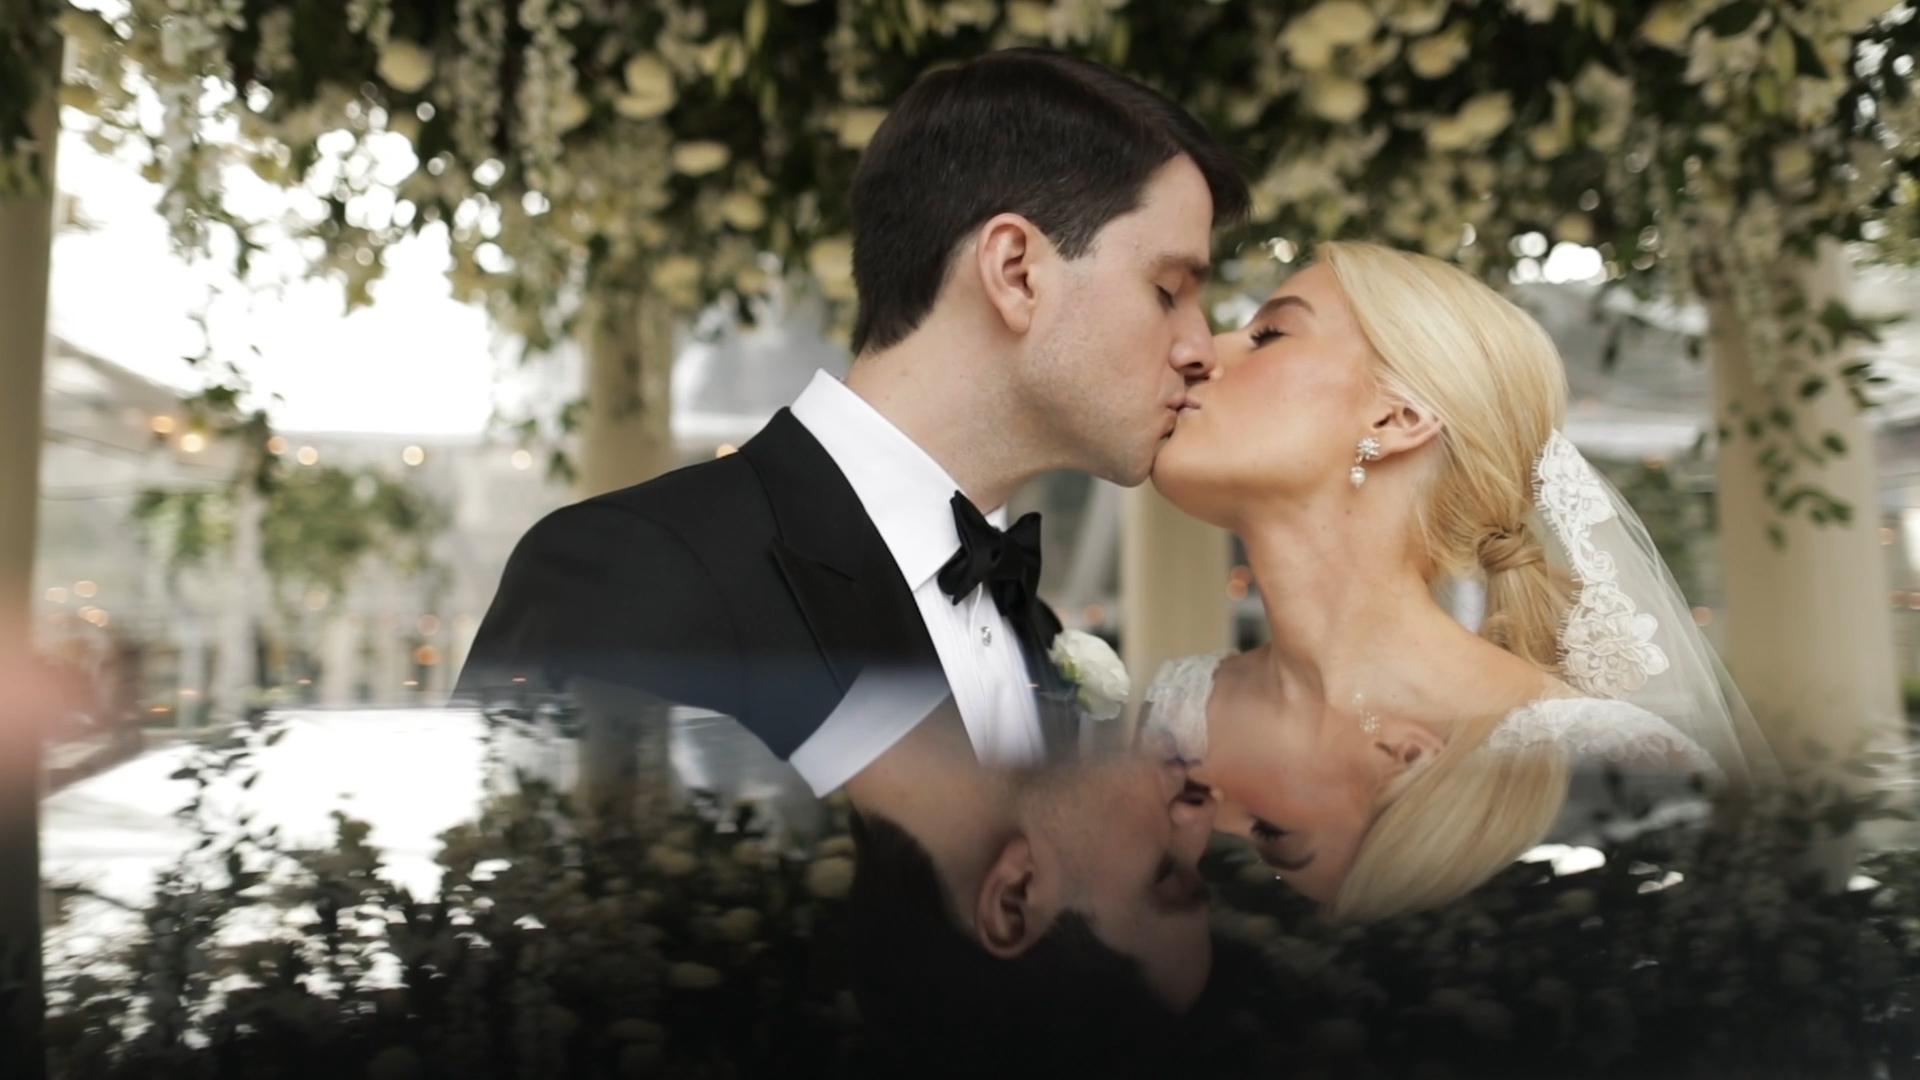 New Orleans Wedding Video_Elms Mansion_Paige and Travis_Marchesa wedding dress veil